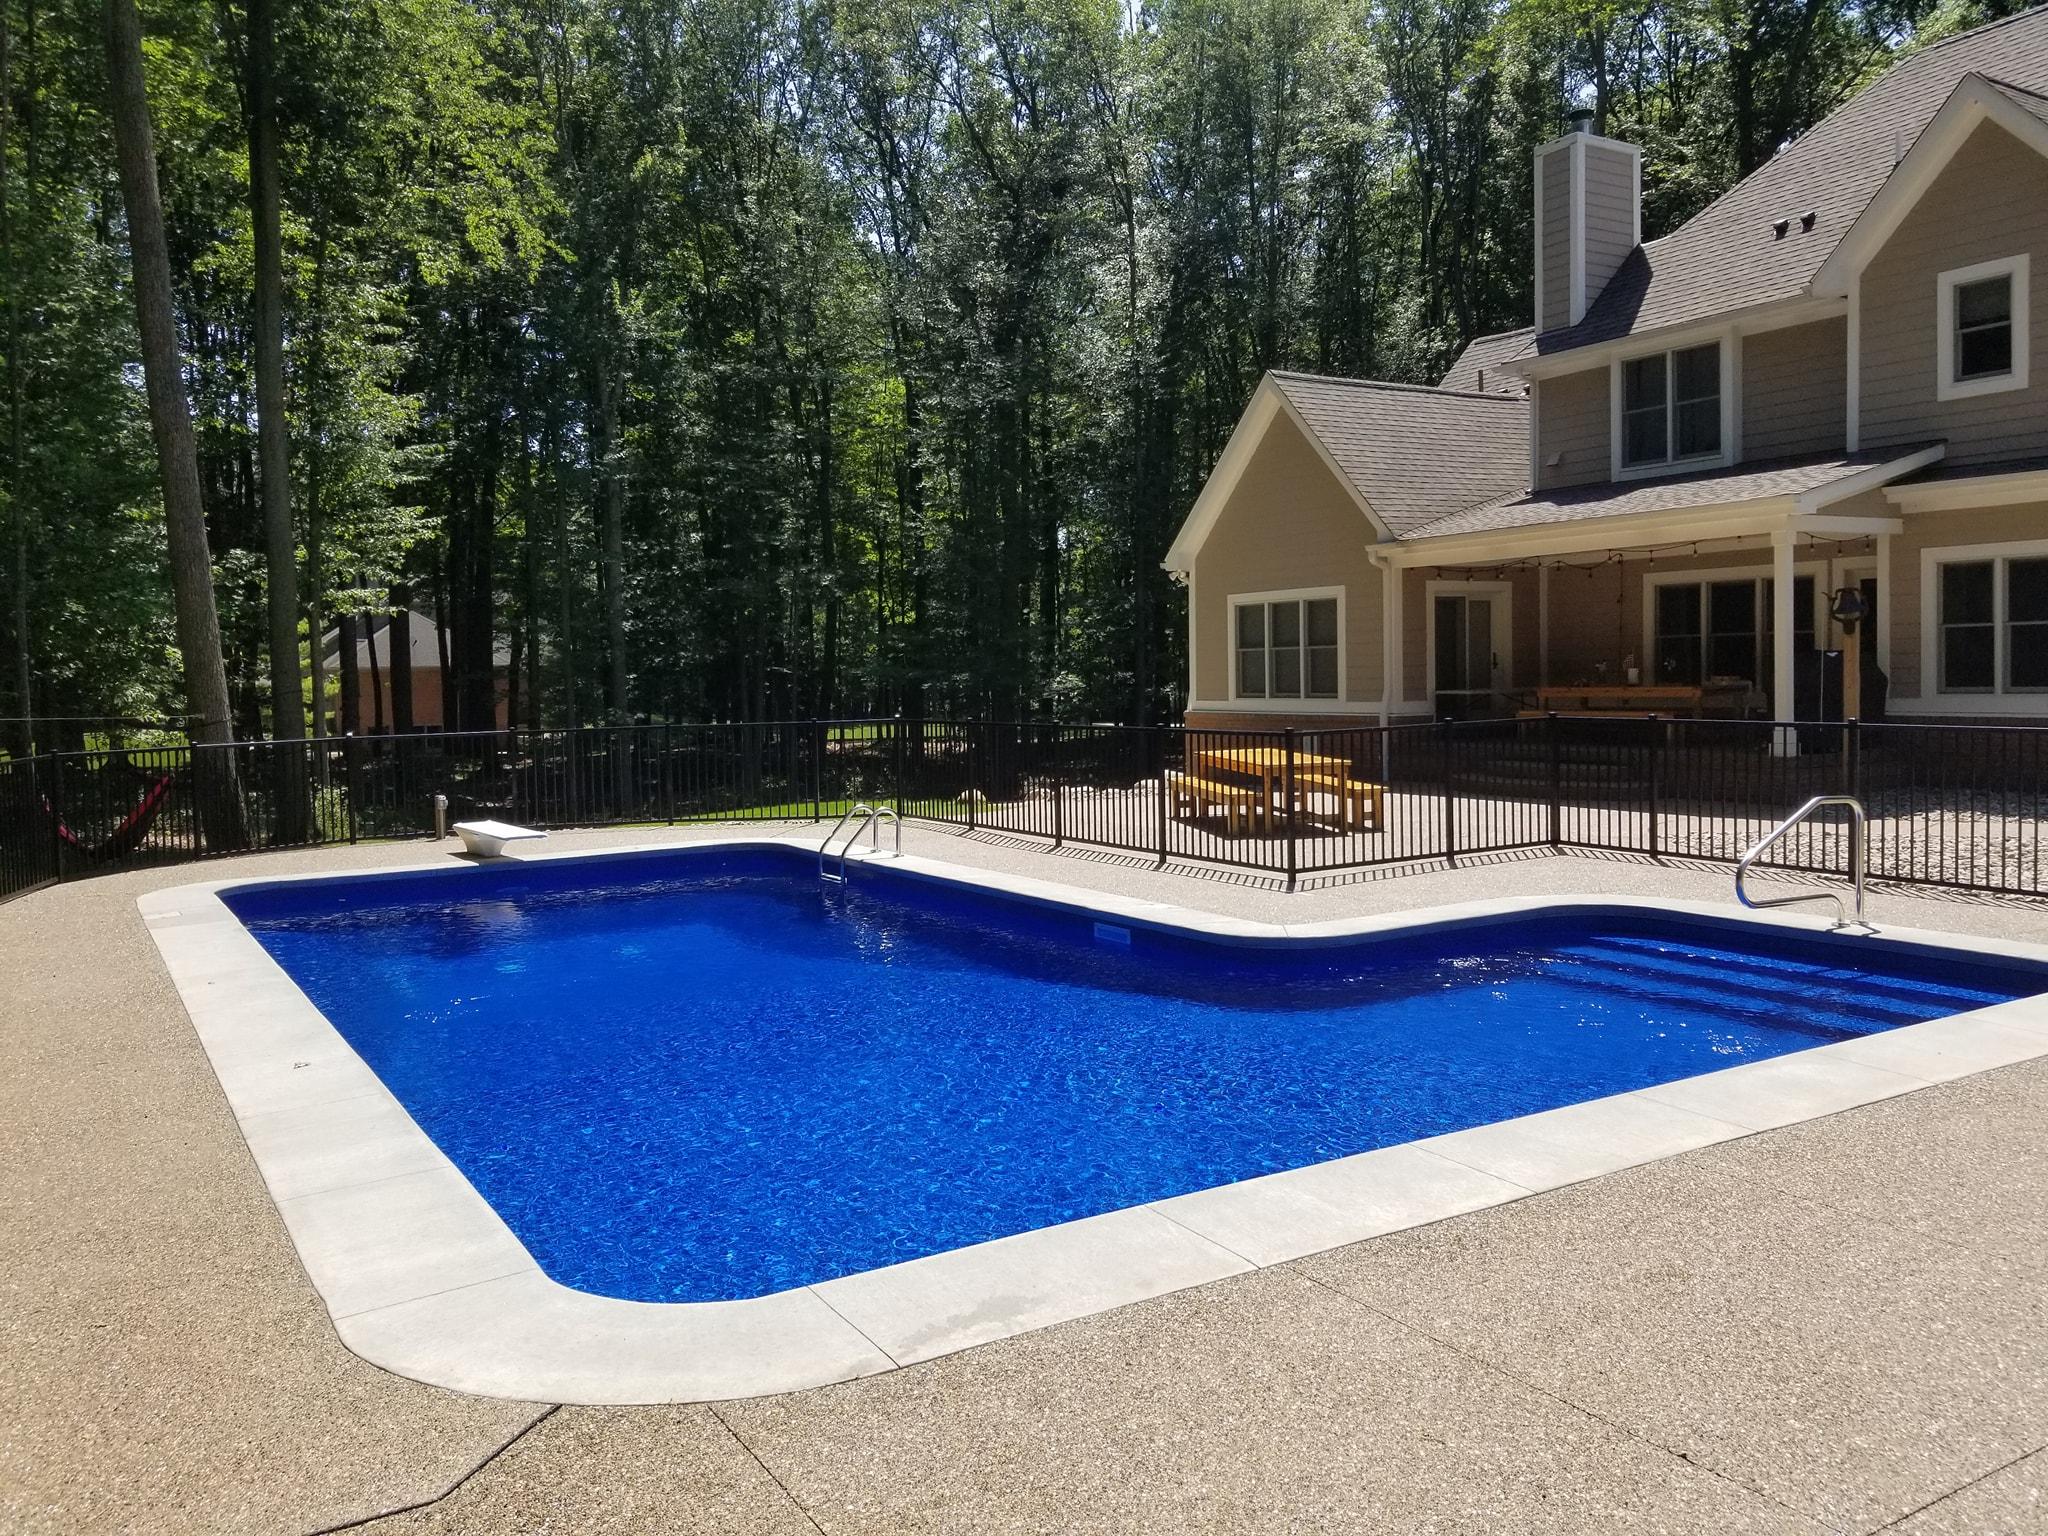 Clarkston Swimming Pool Service